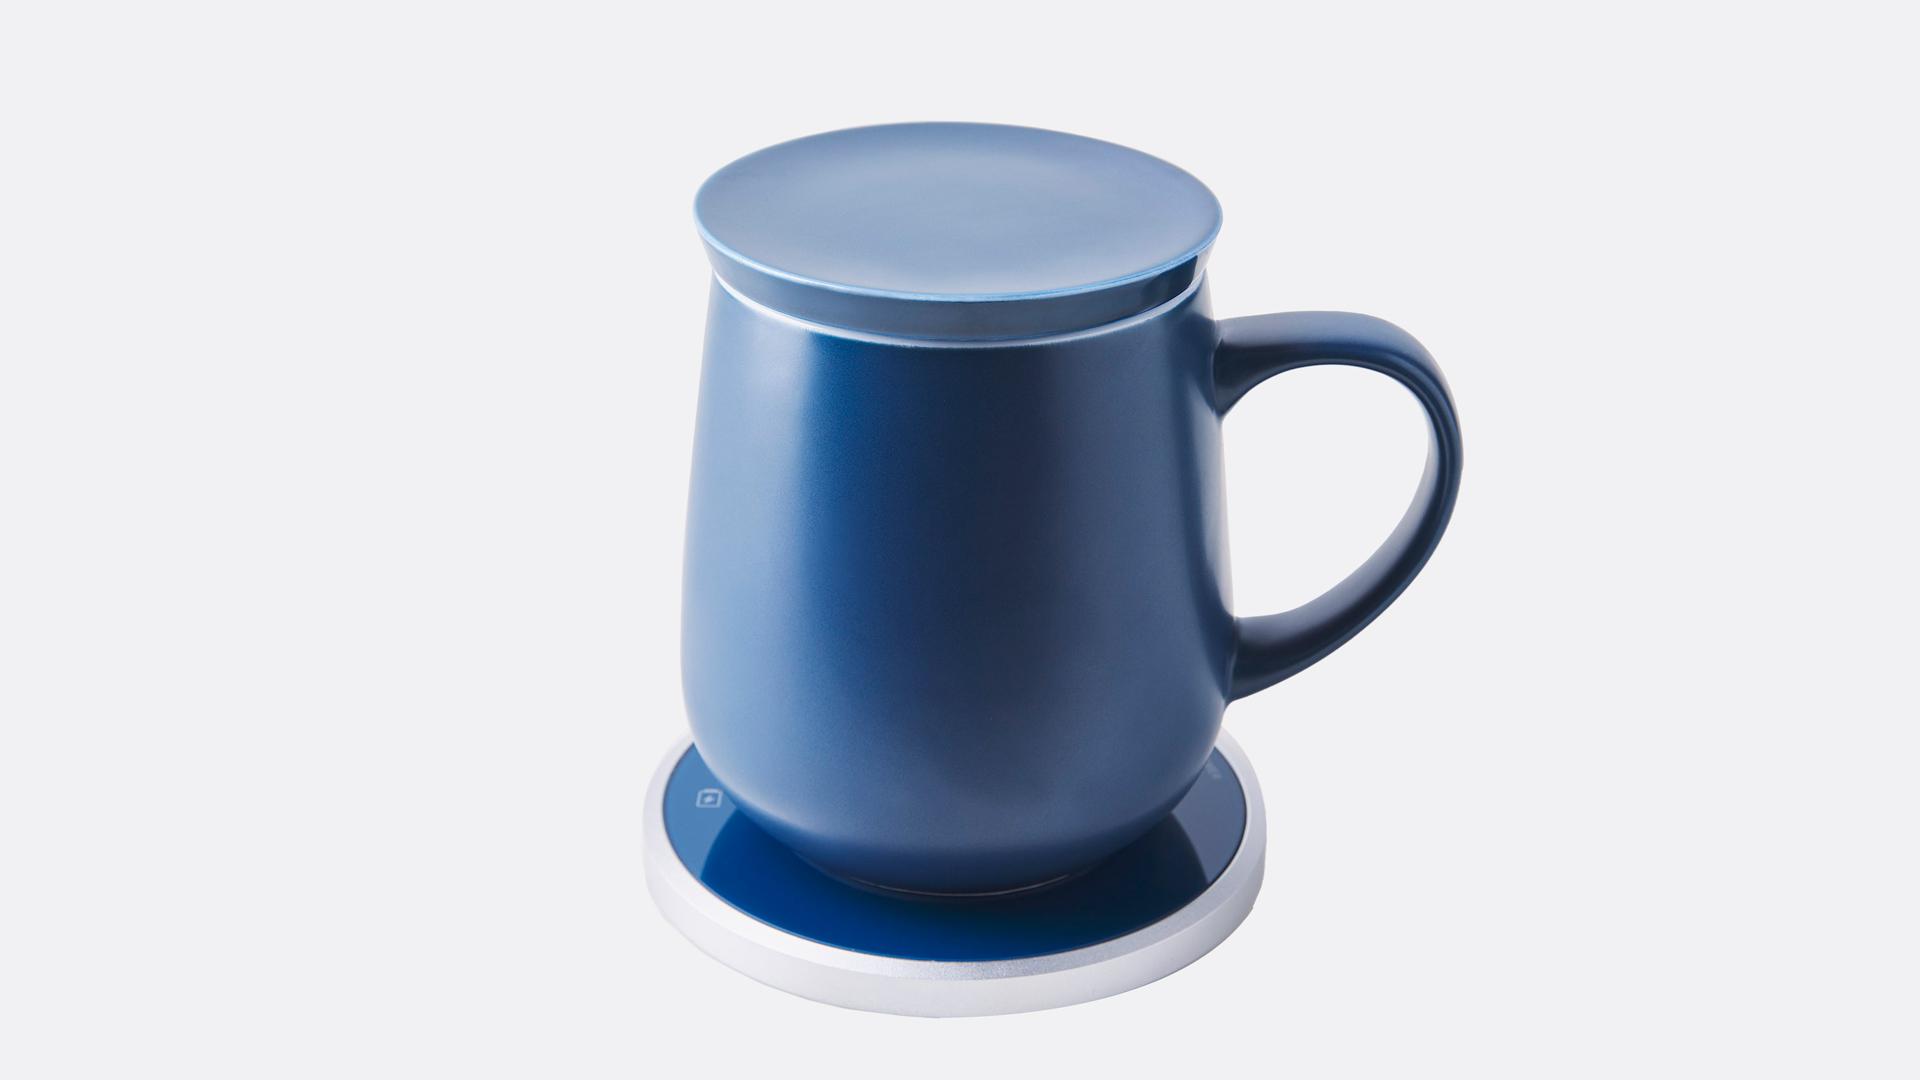 Ohom Self-Heating Mug